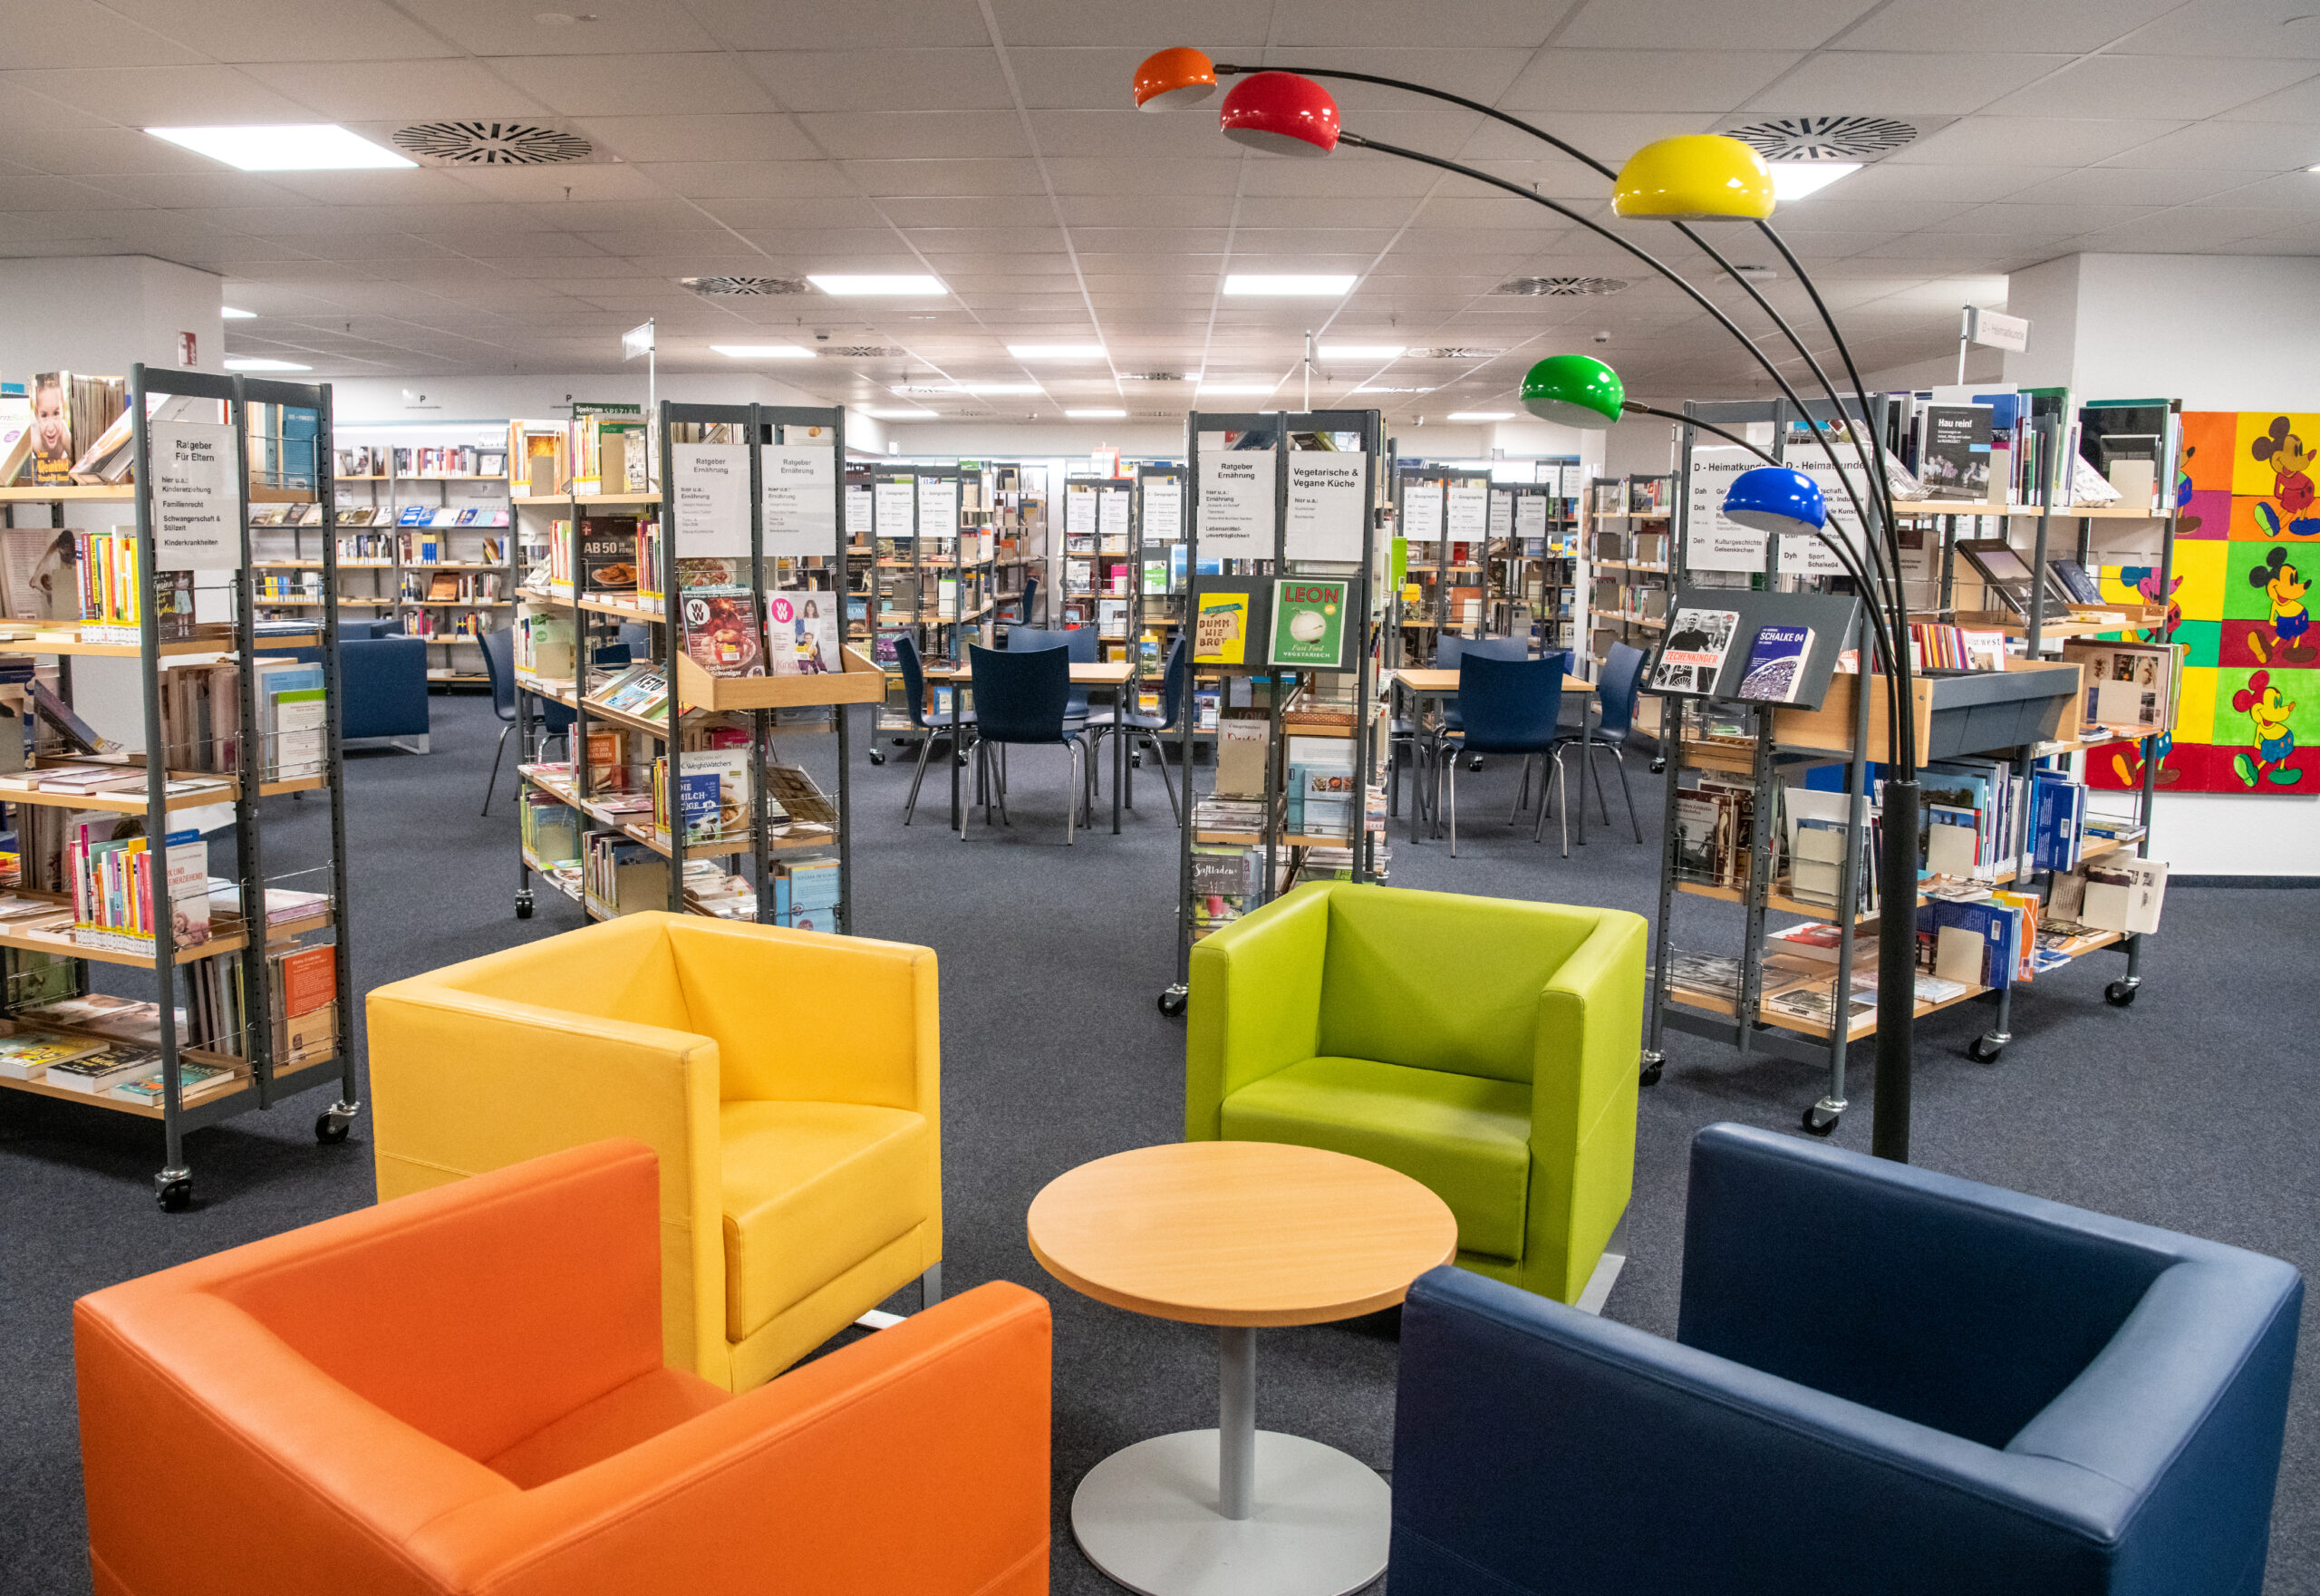 Stadtteilbibliothek Buer am 5.02.2020 in Gelsenkirchen. Foto: Stadt Gelsenkirchen/ Caroline Seidel